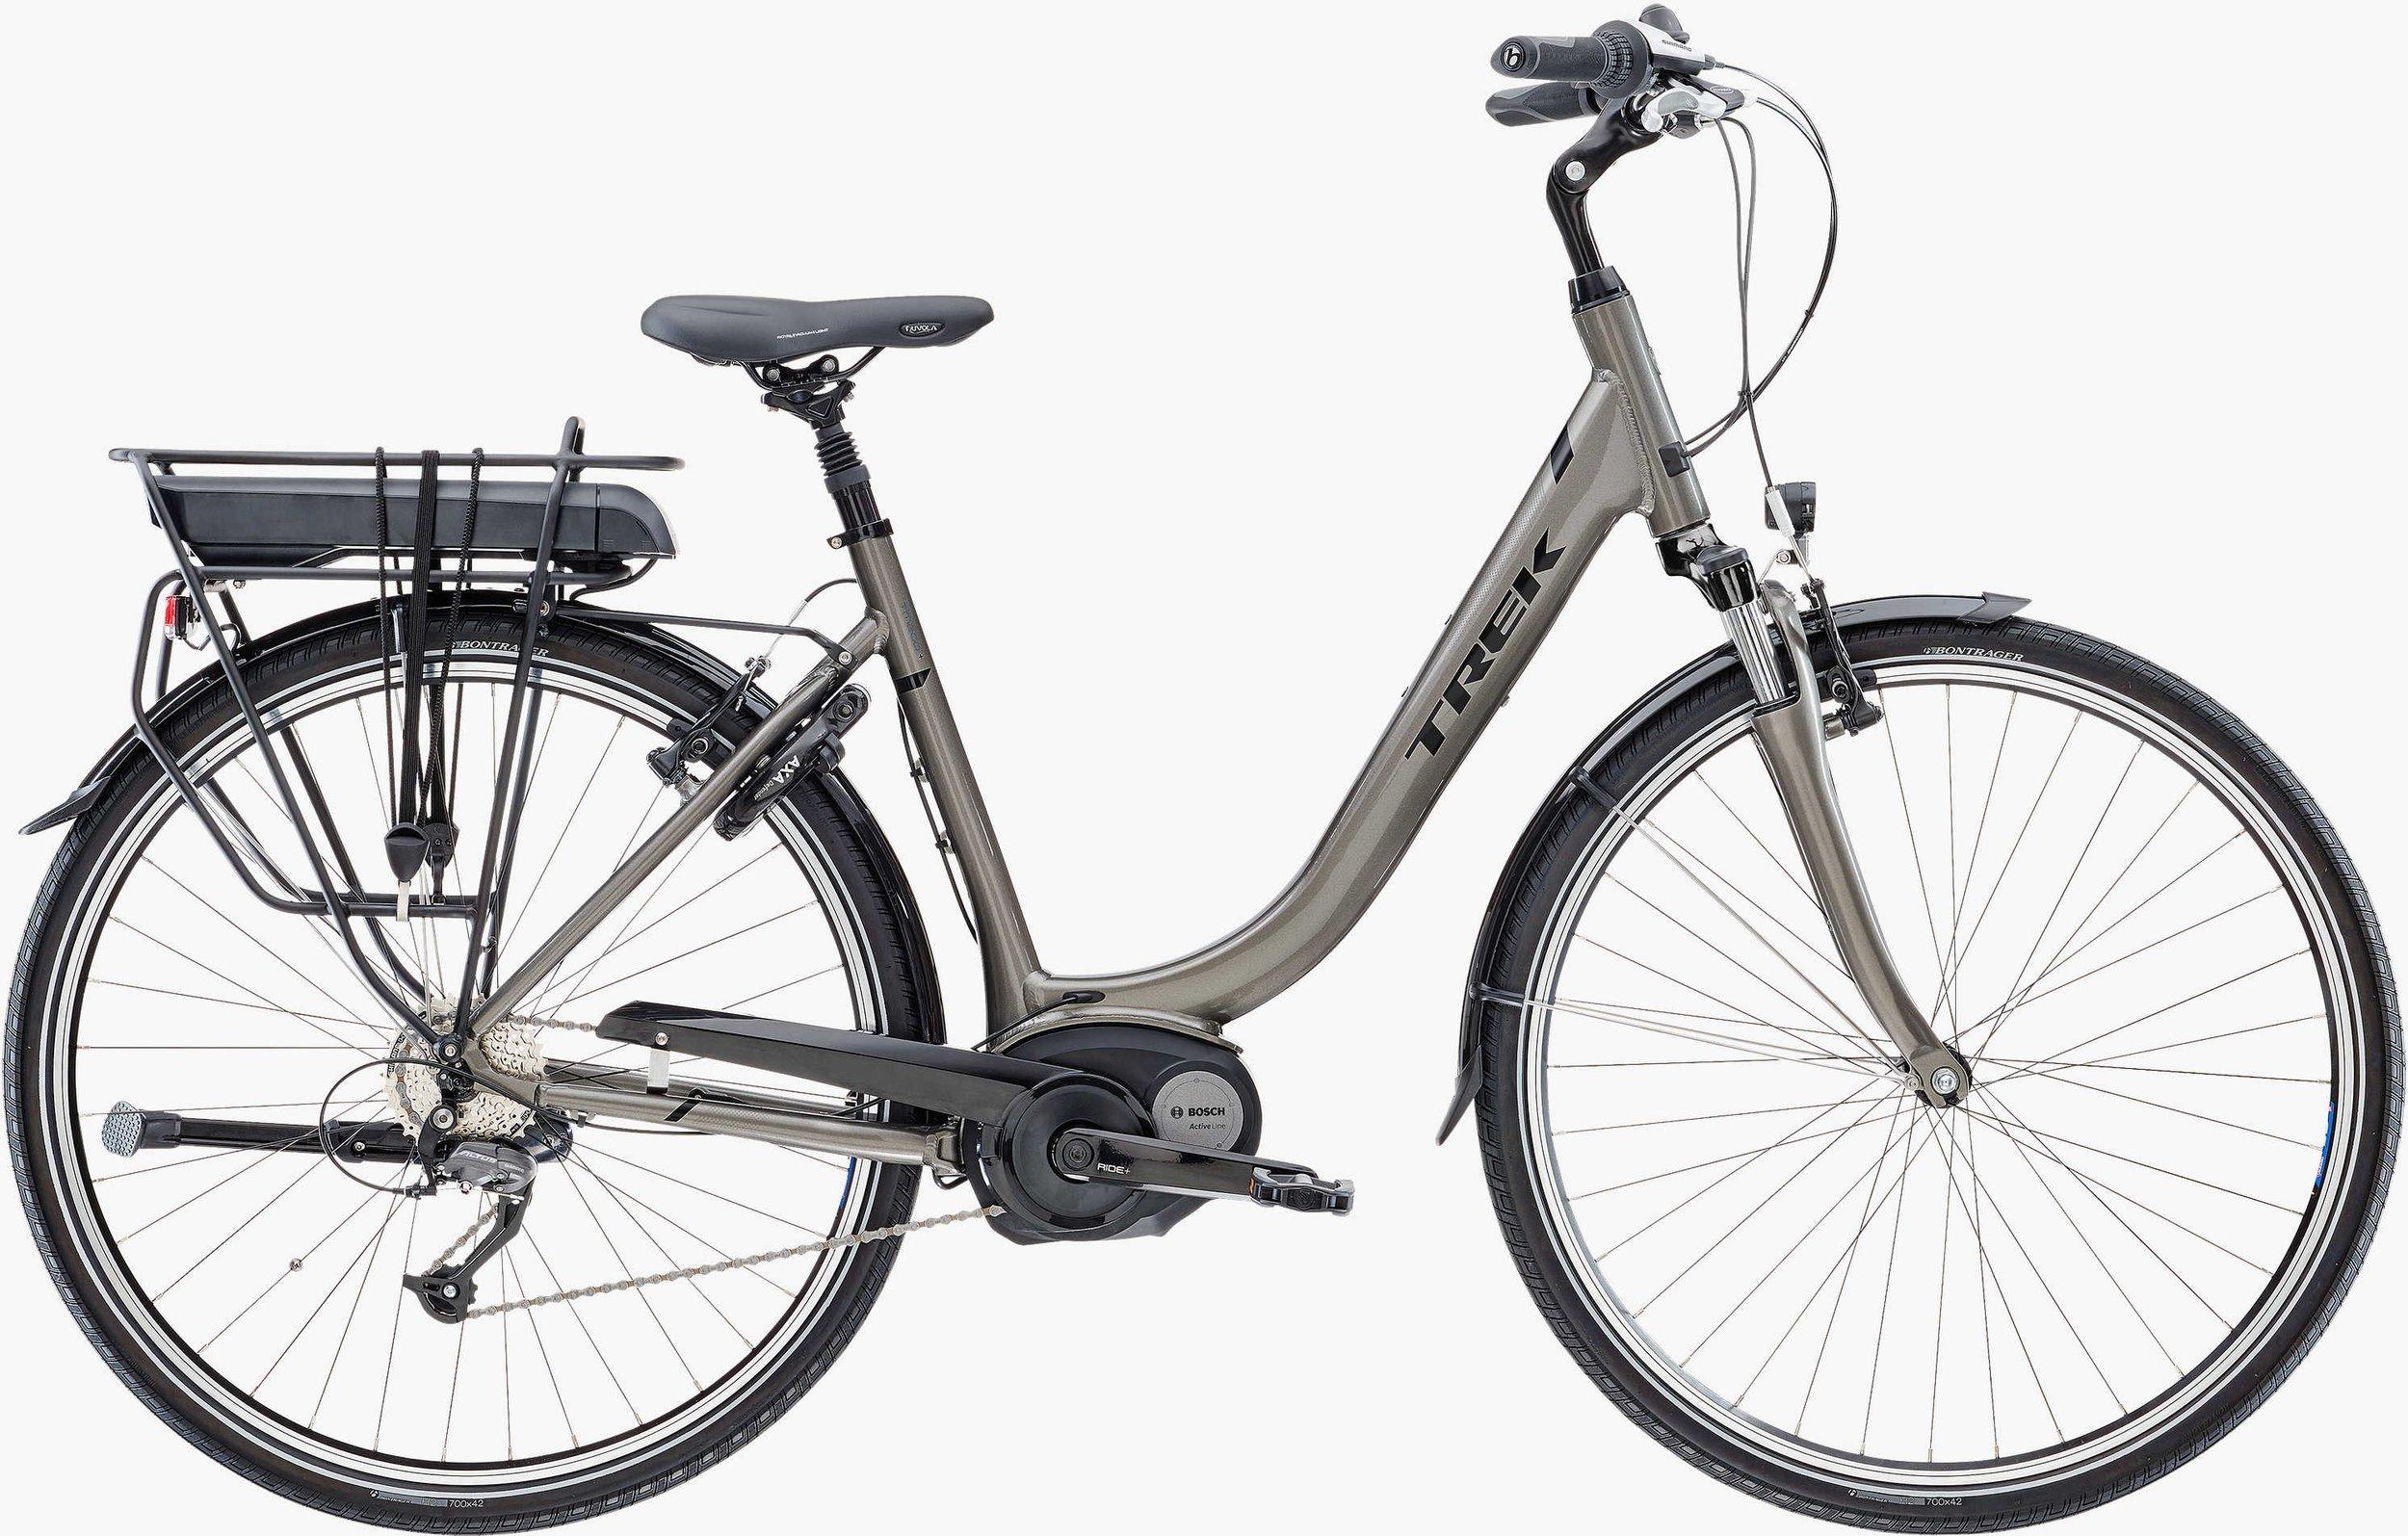 Bike review: Trek TM200 + Lowstep Electric Bike — Everyone